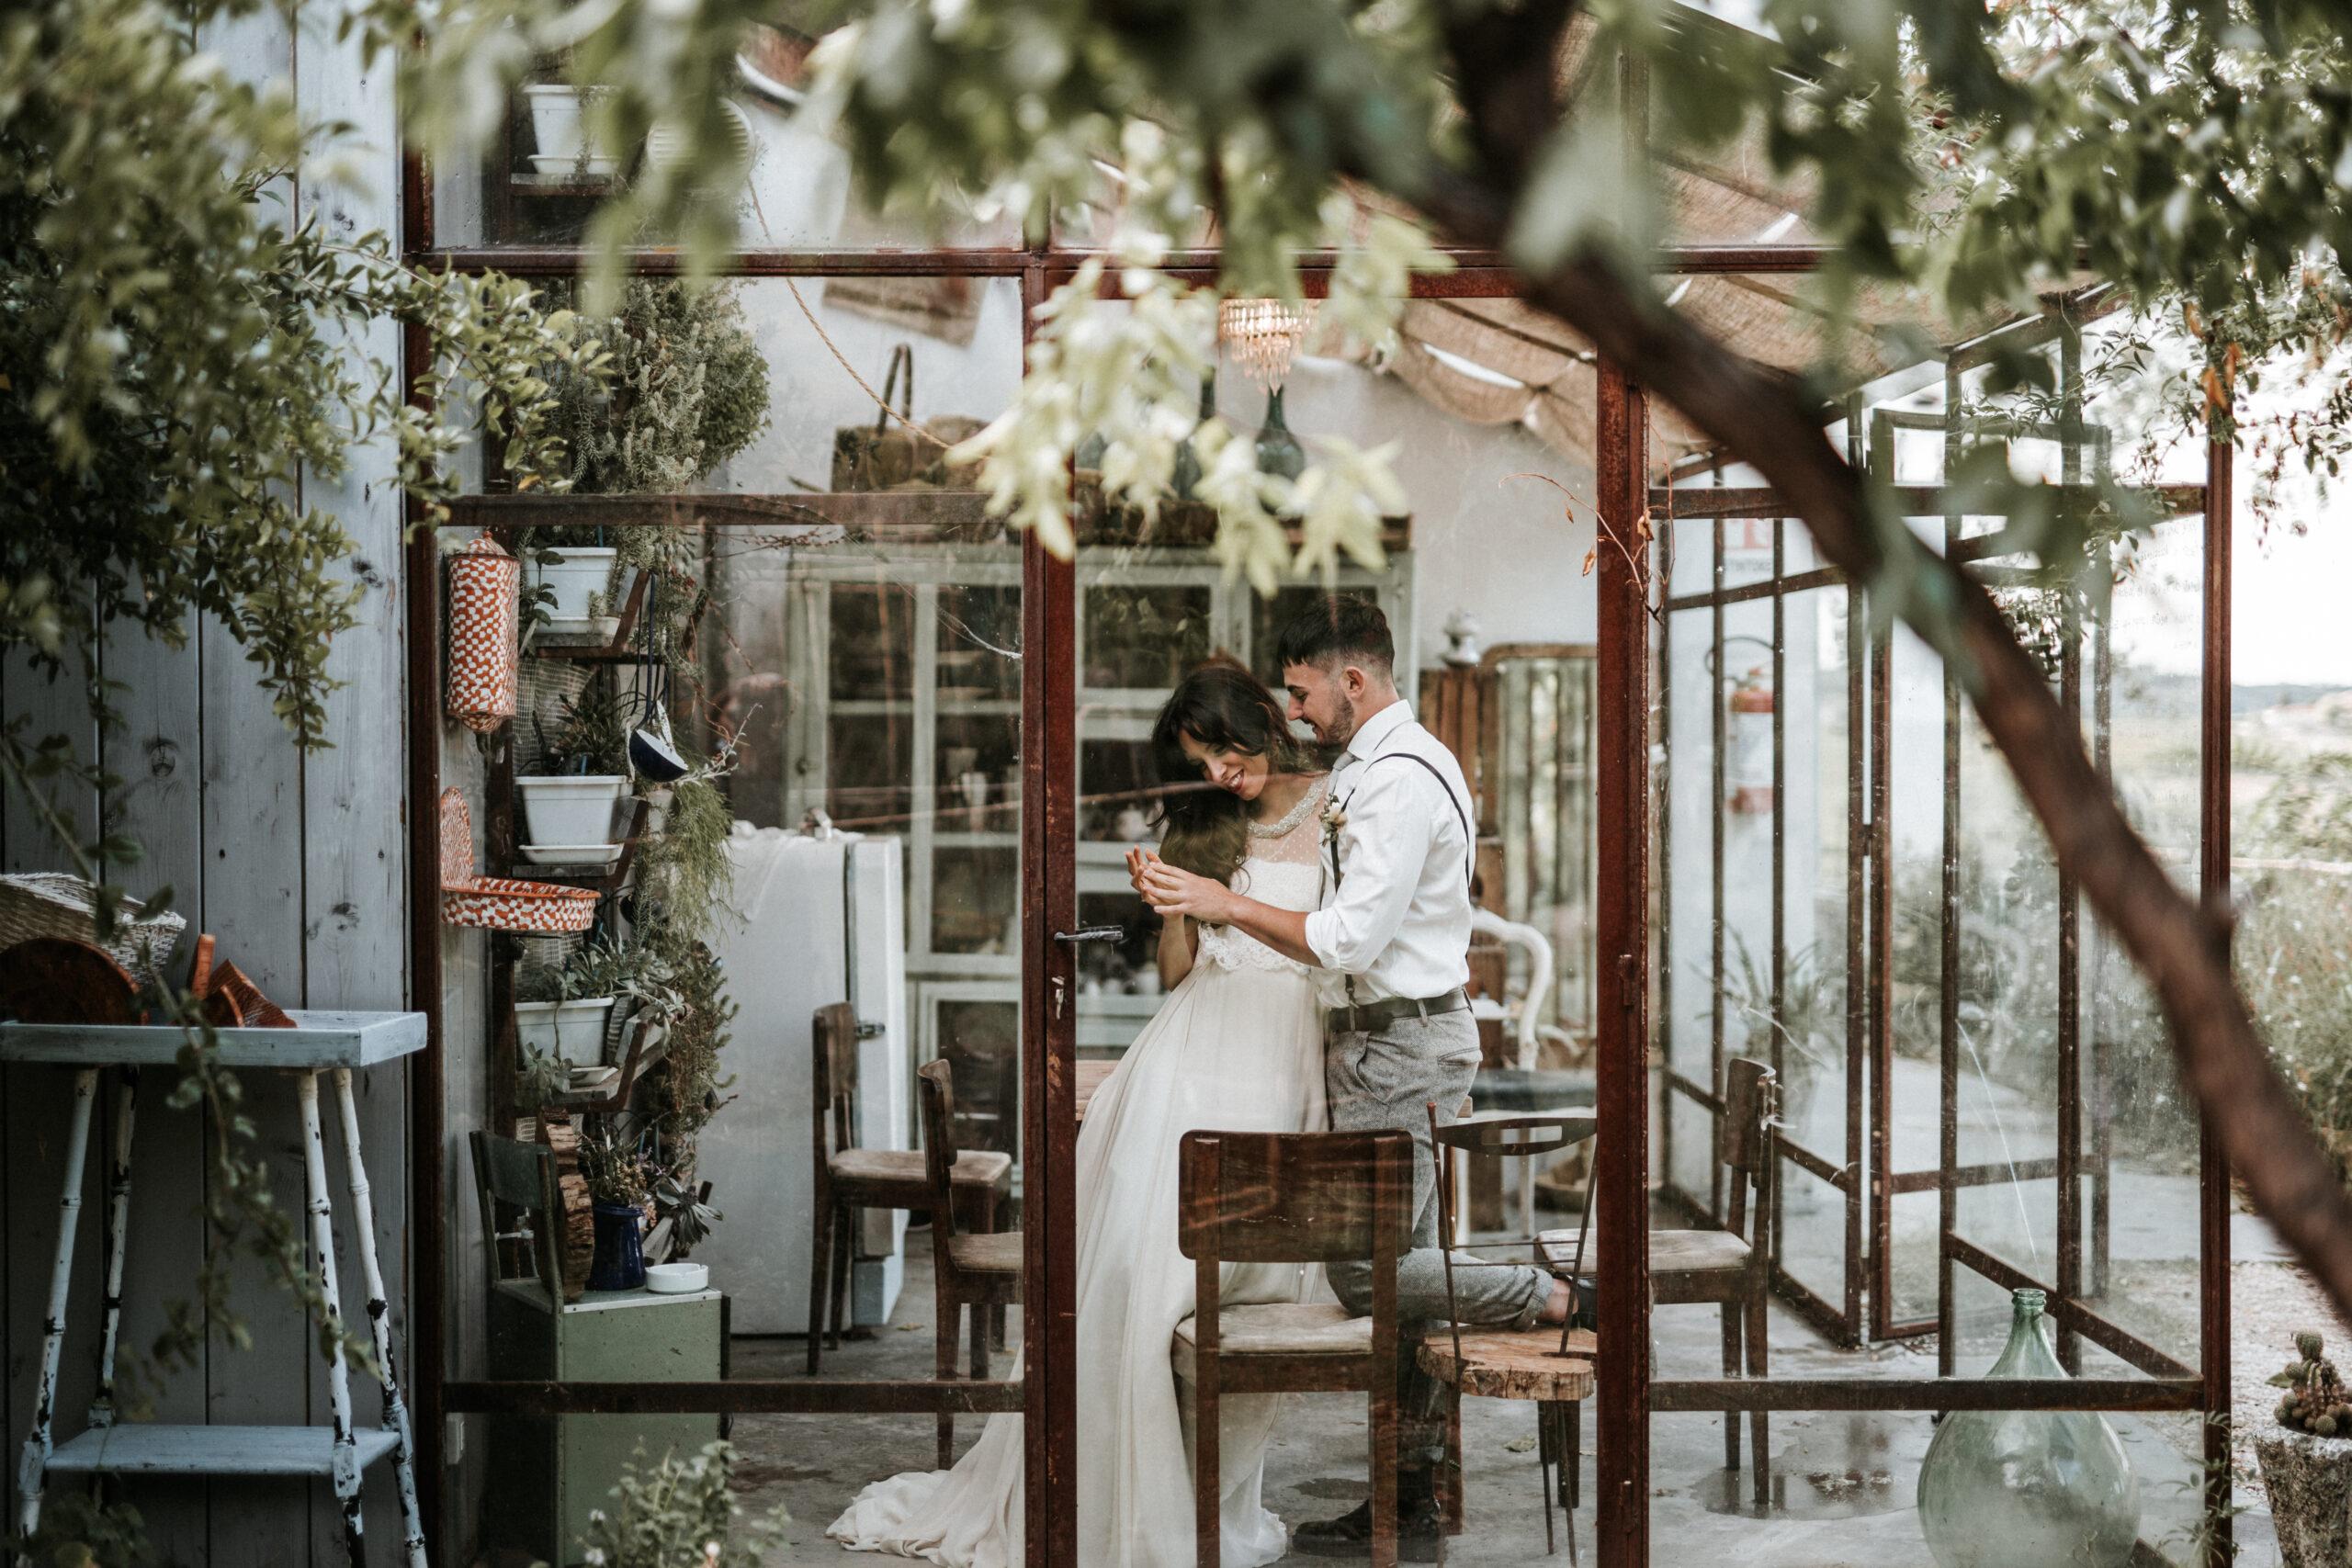 Matrimonio a Chieti